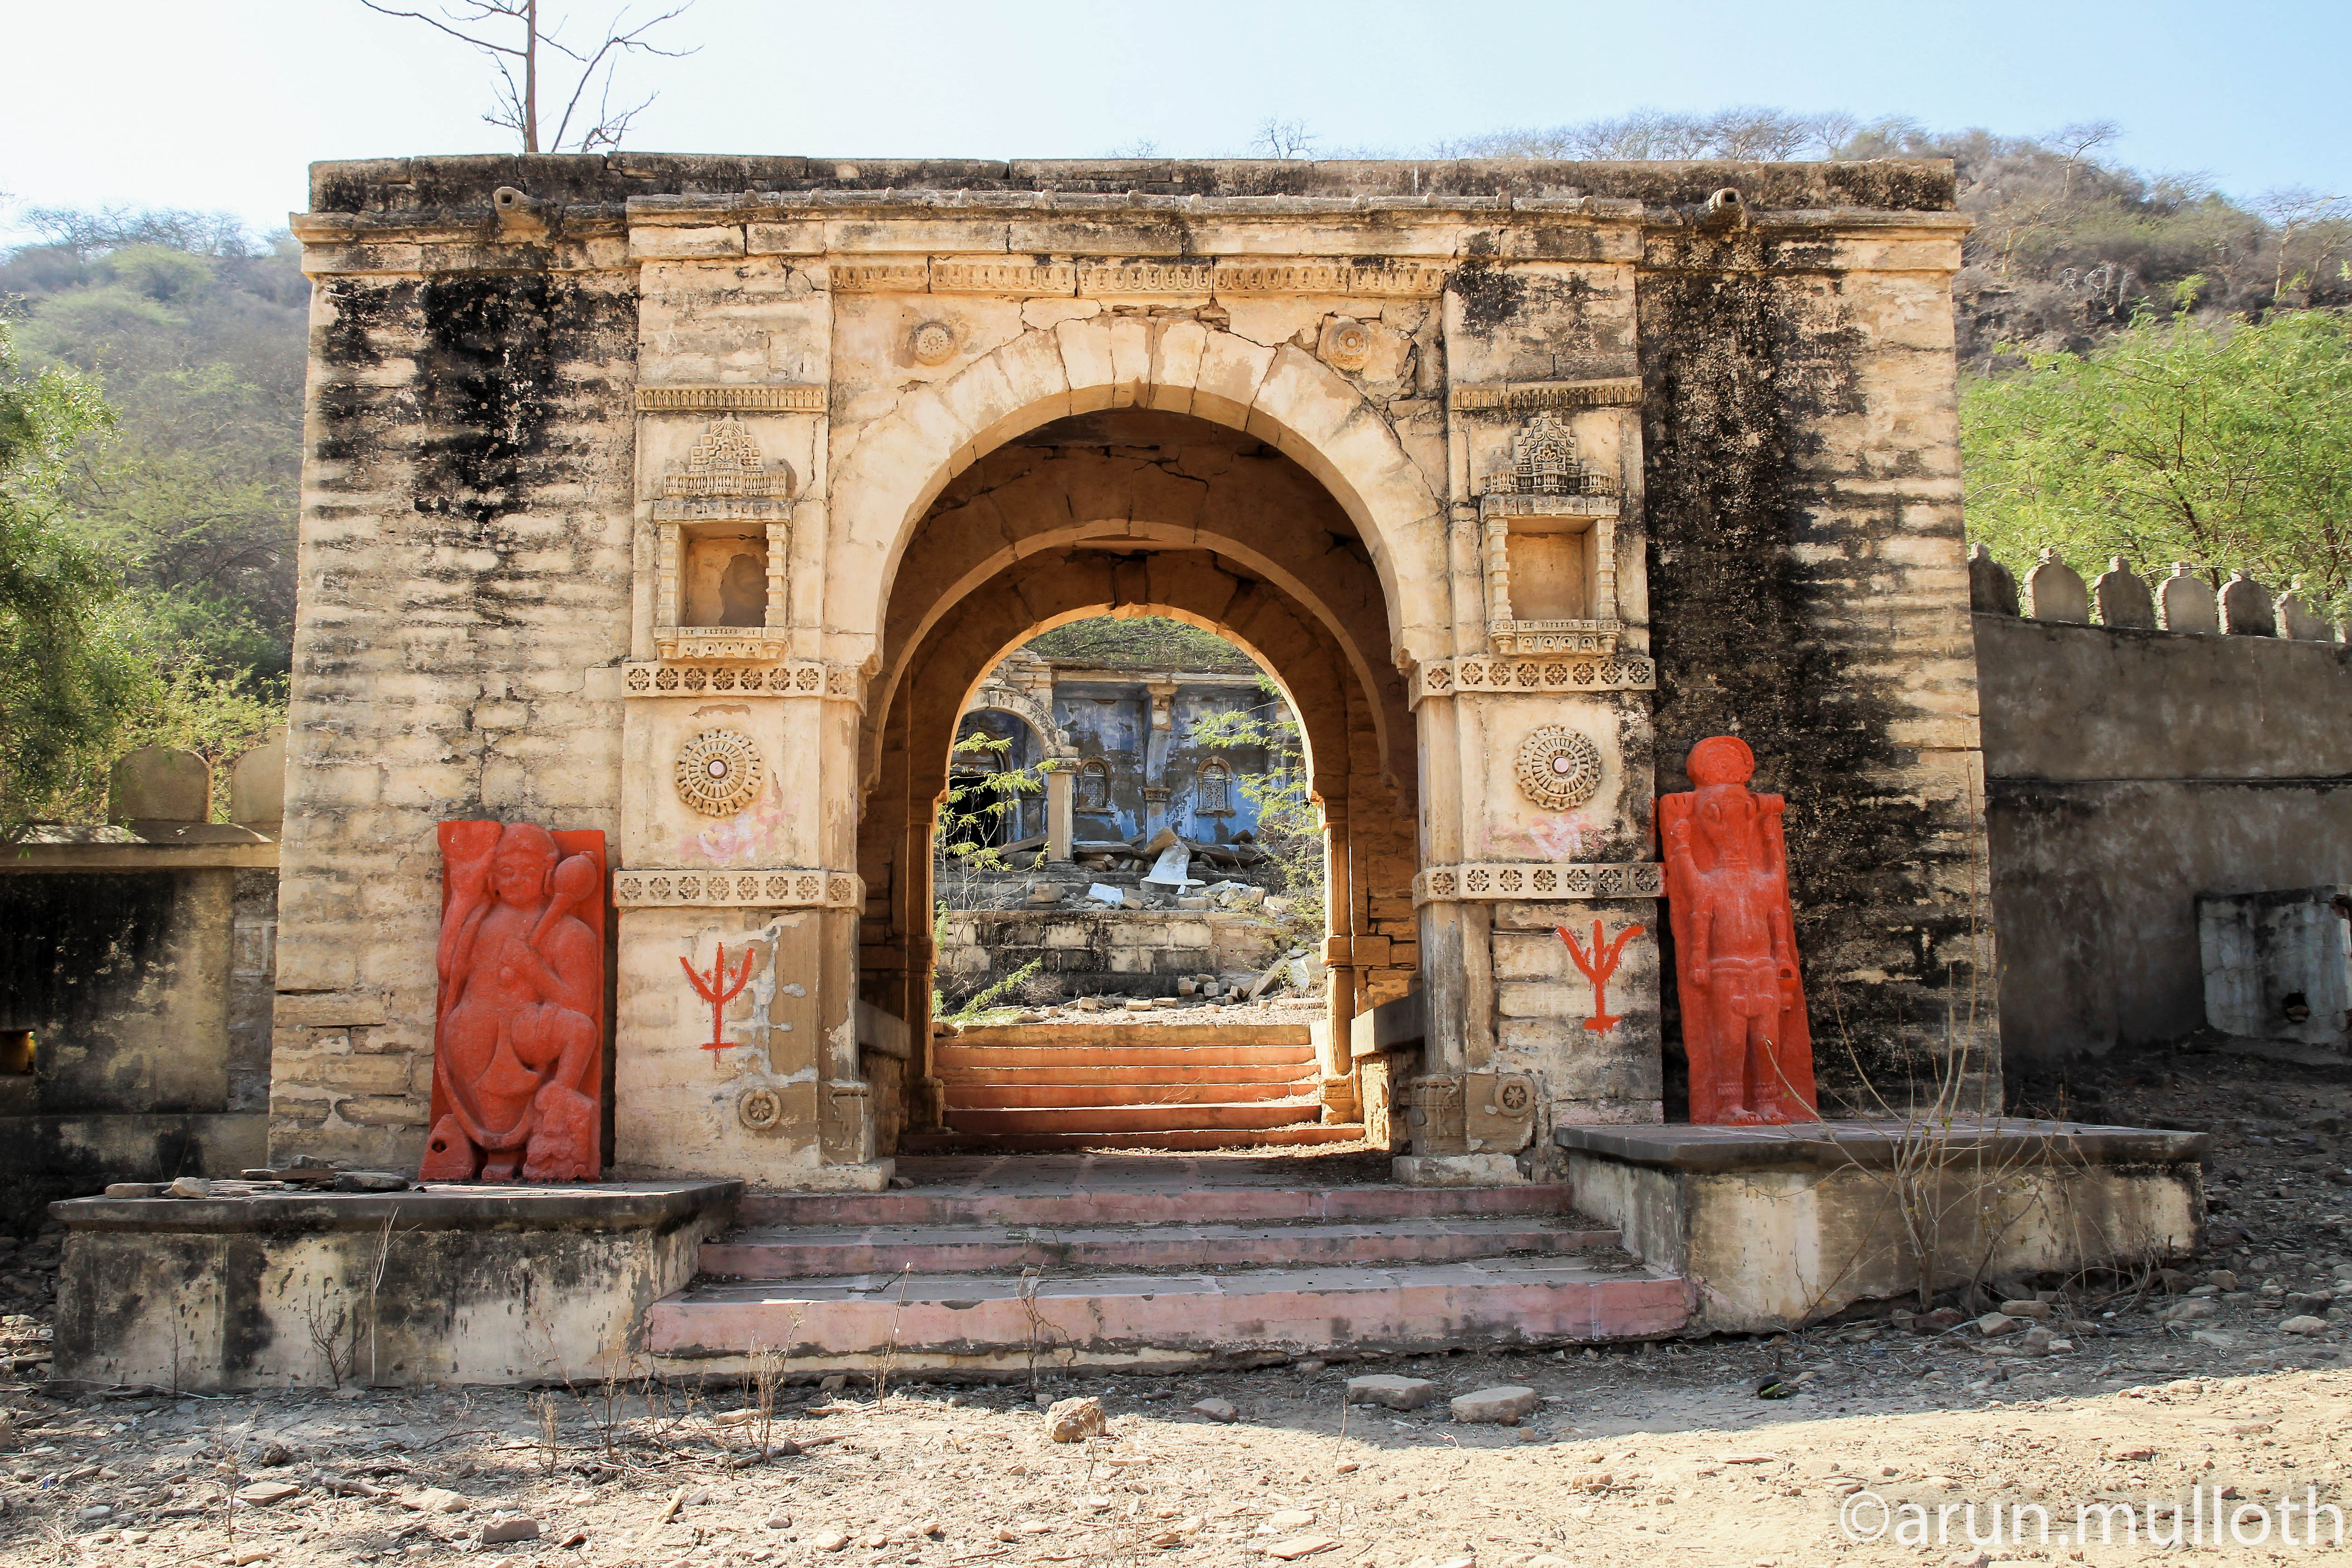 Than Monastery, Bhuj